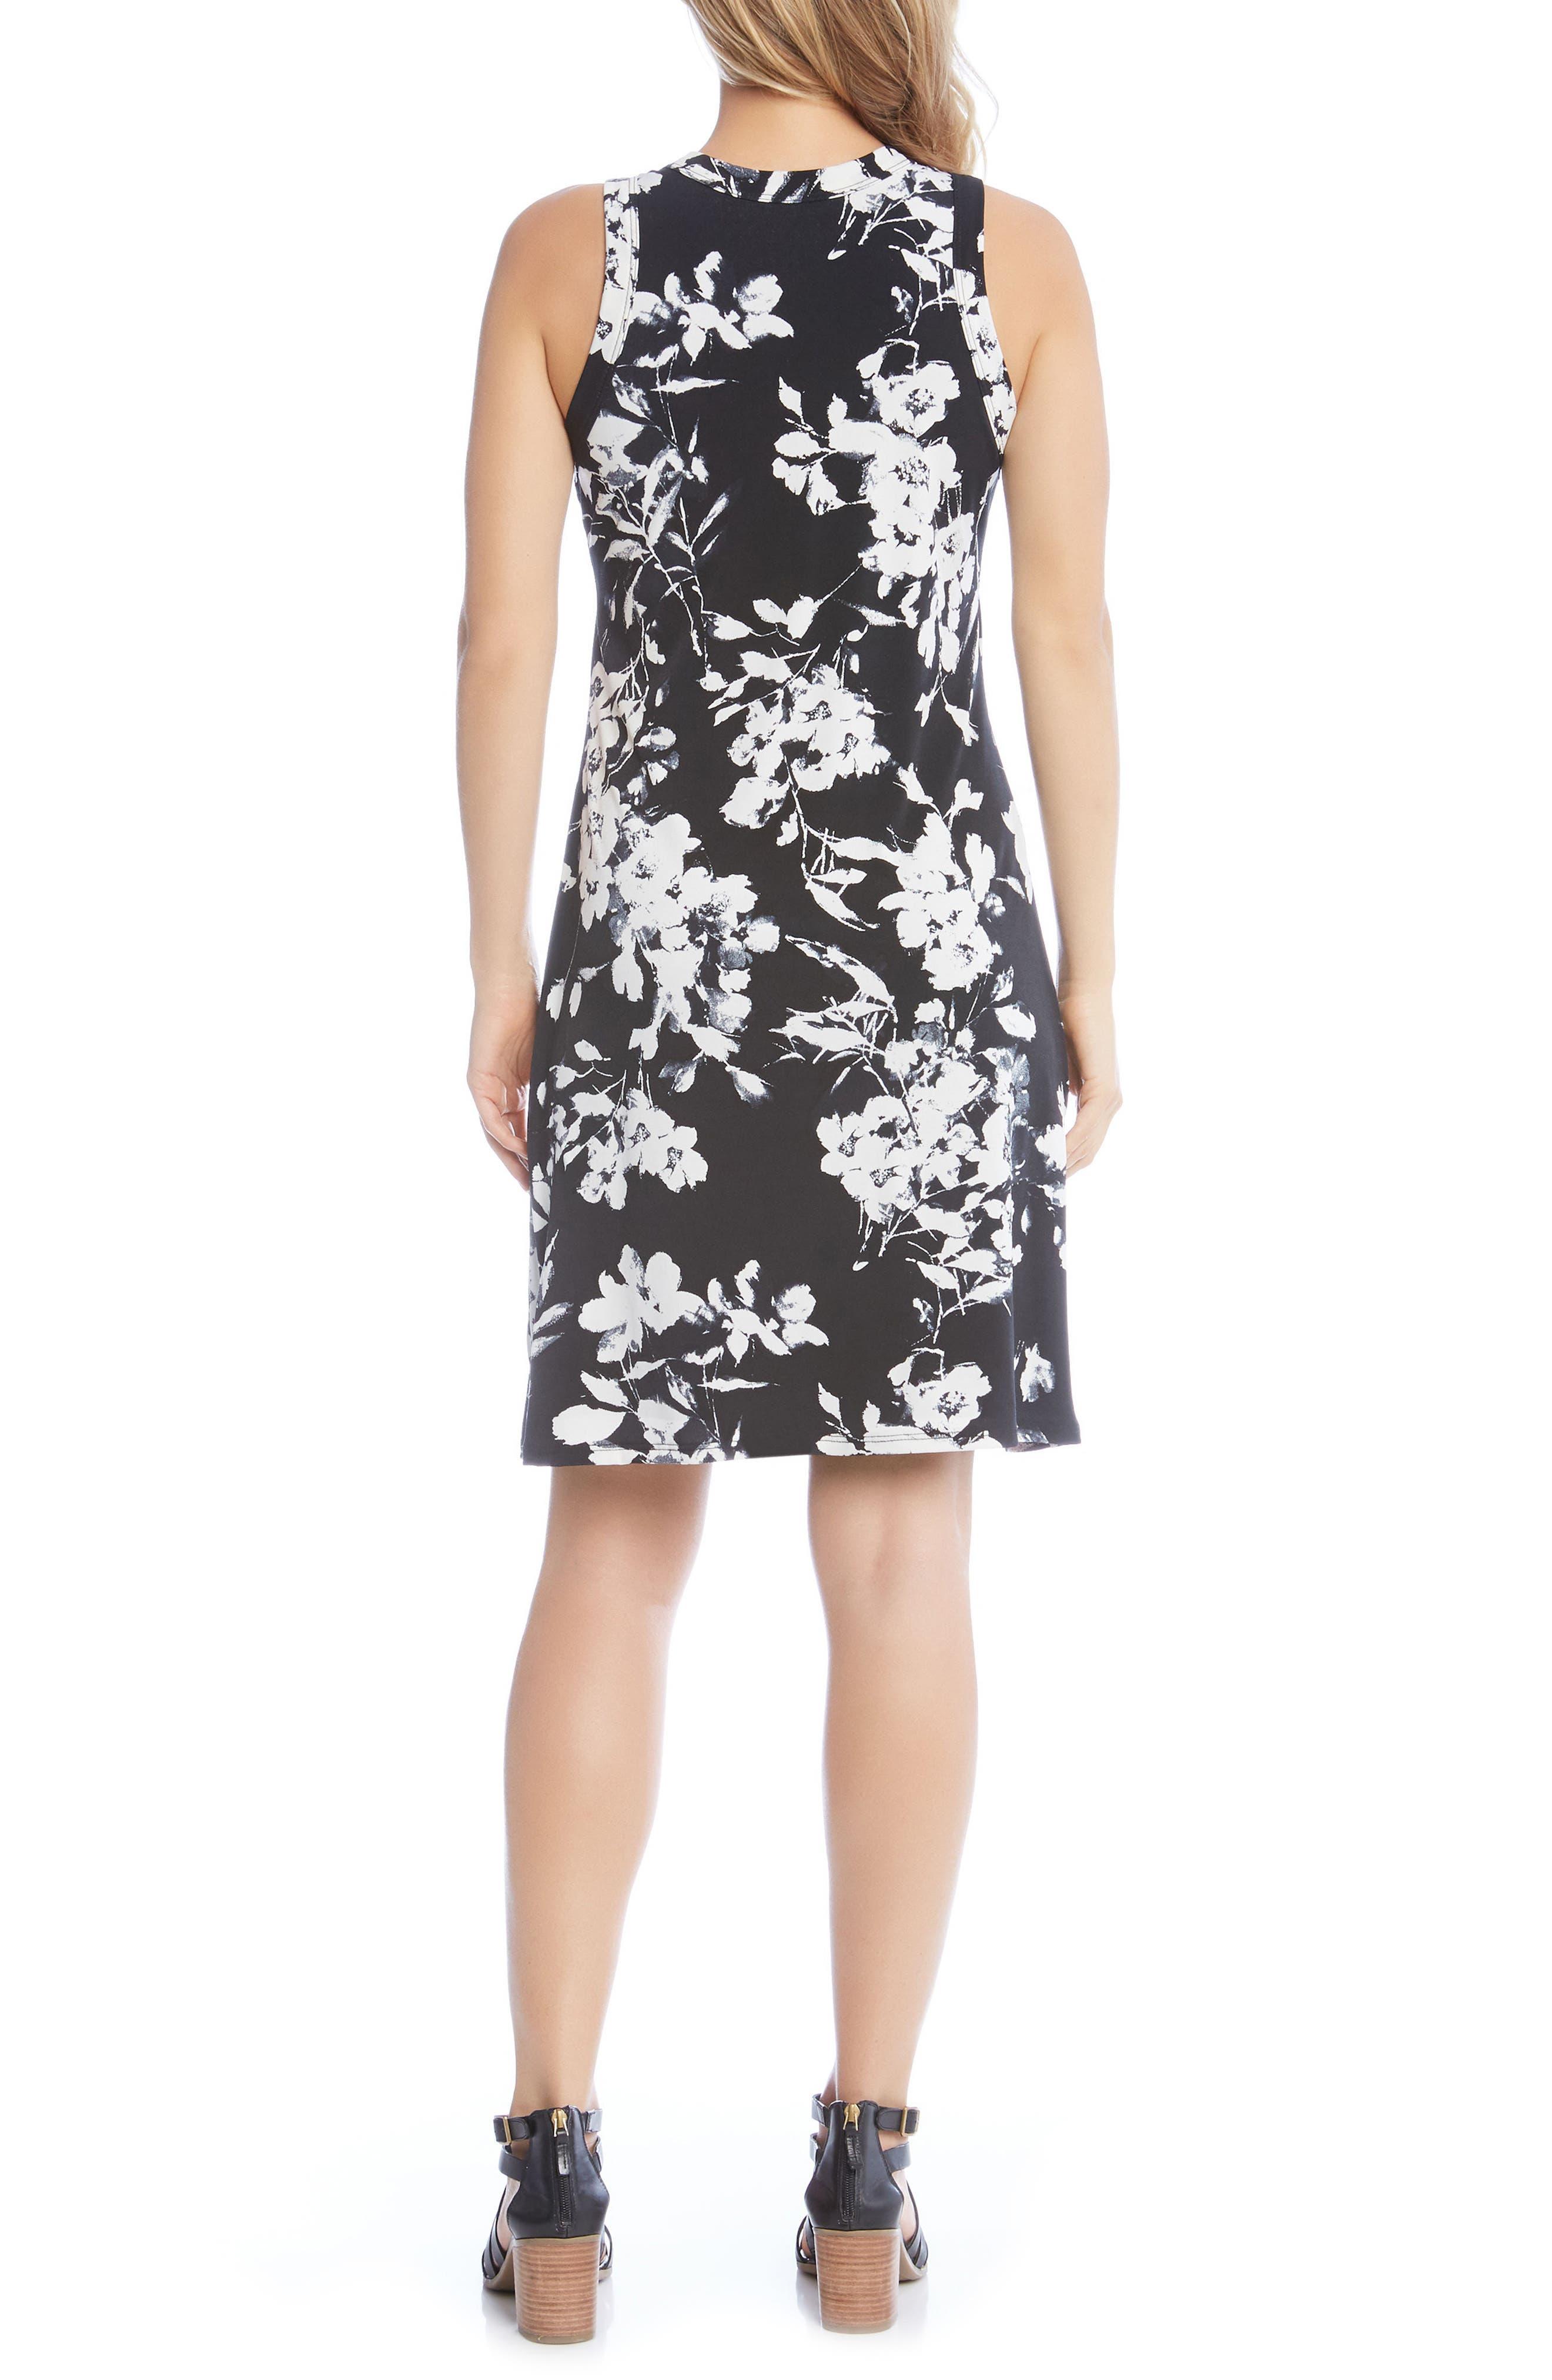 Floral Print Knit Dress,                             Alternate thumbnail 2, color,                             Black/ Off White